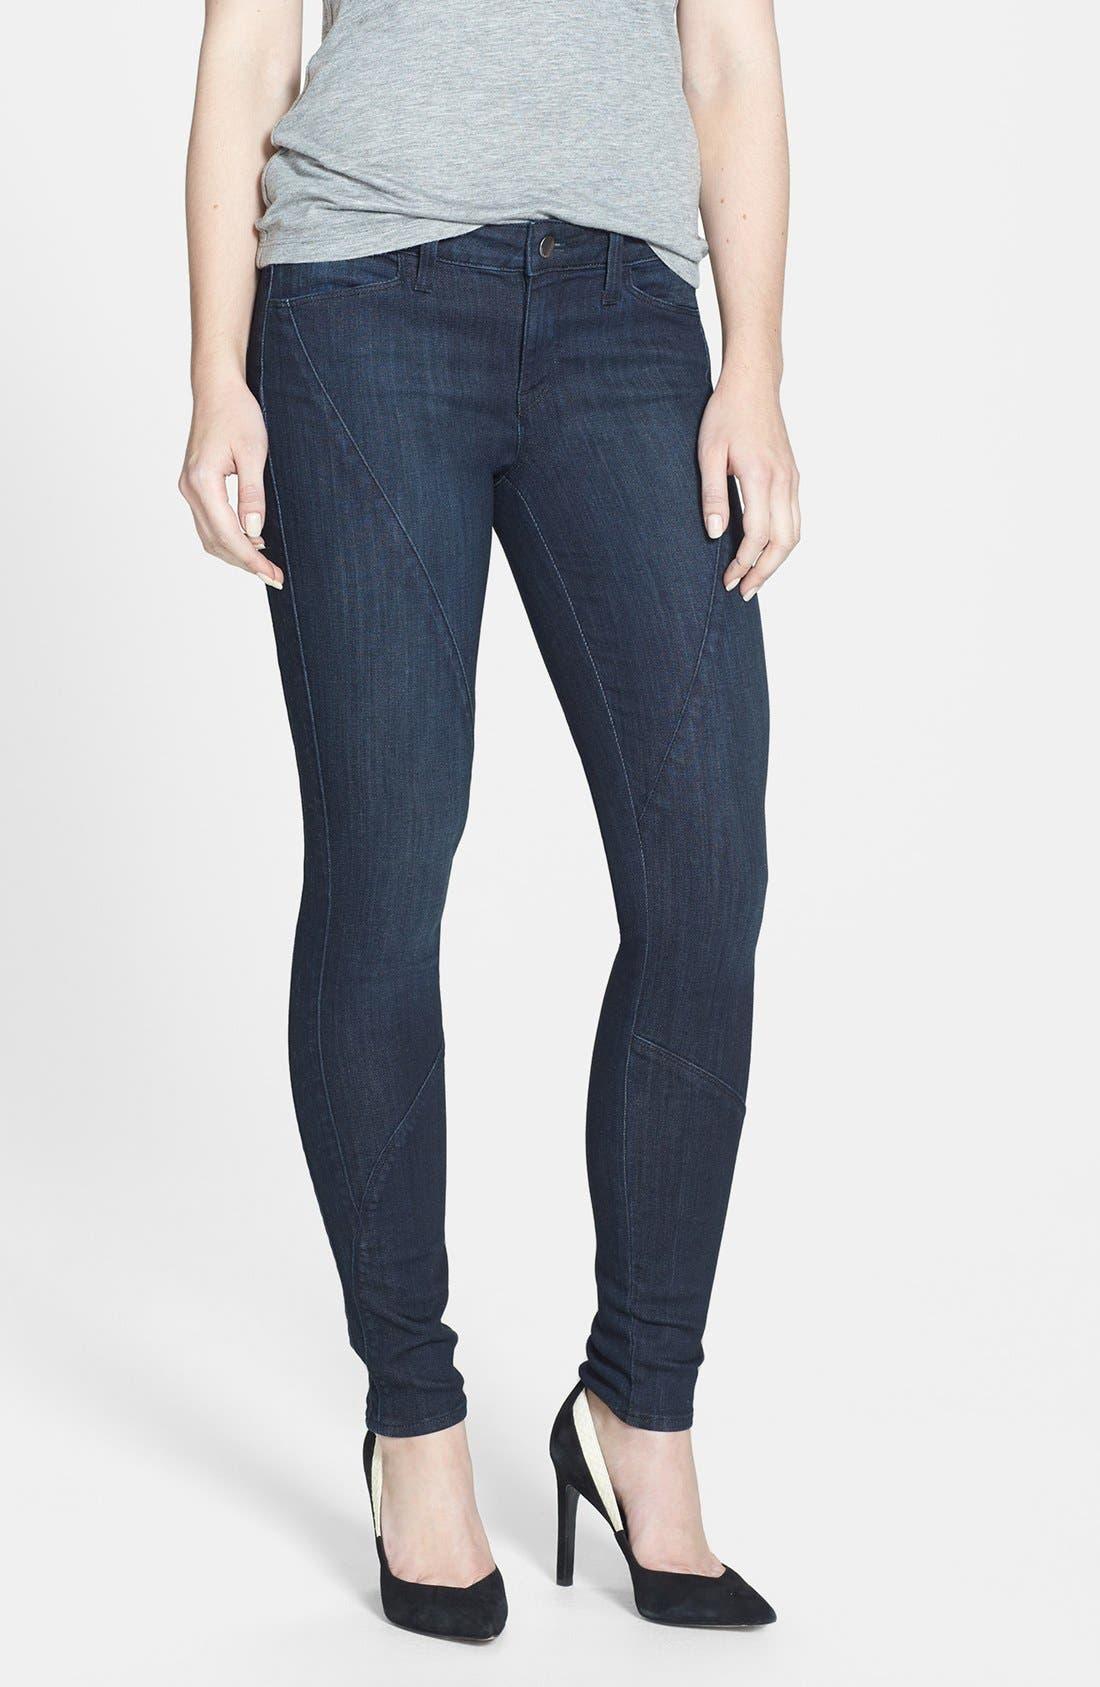 Main Image - Genetic 'Semira' Seamed Cigarette Skinny Jeans (Impulse)